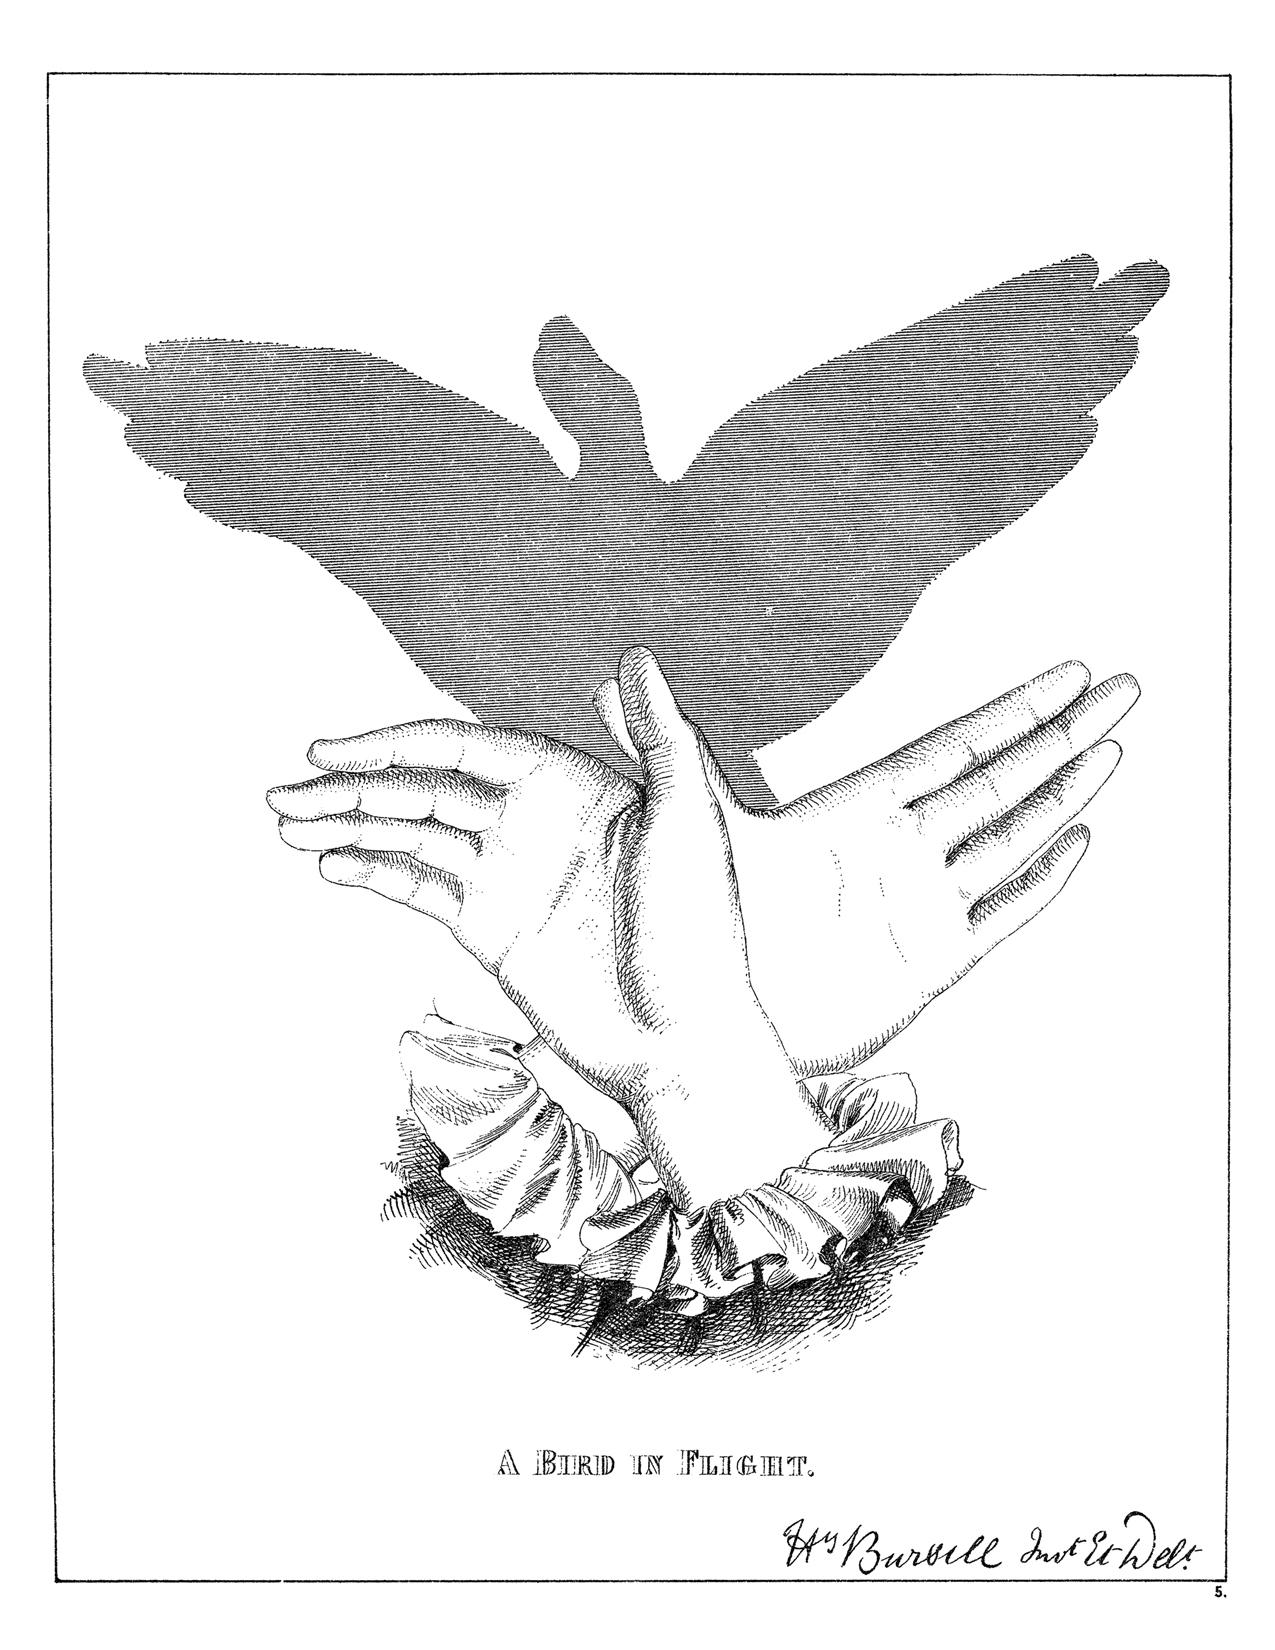 graphic regarding Printable Shadow Puppets called Typical Shadow Puppet Chicken Printable! - The Graphics Fairy